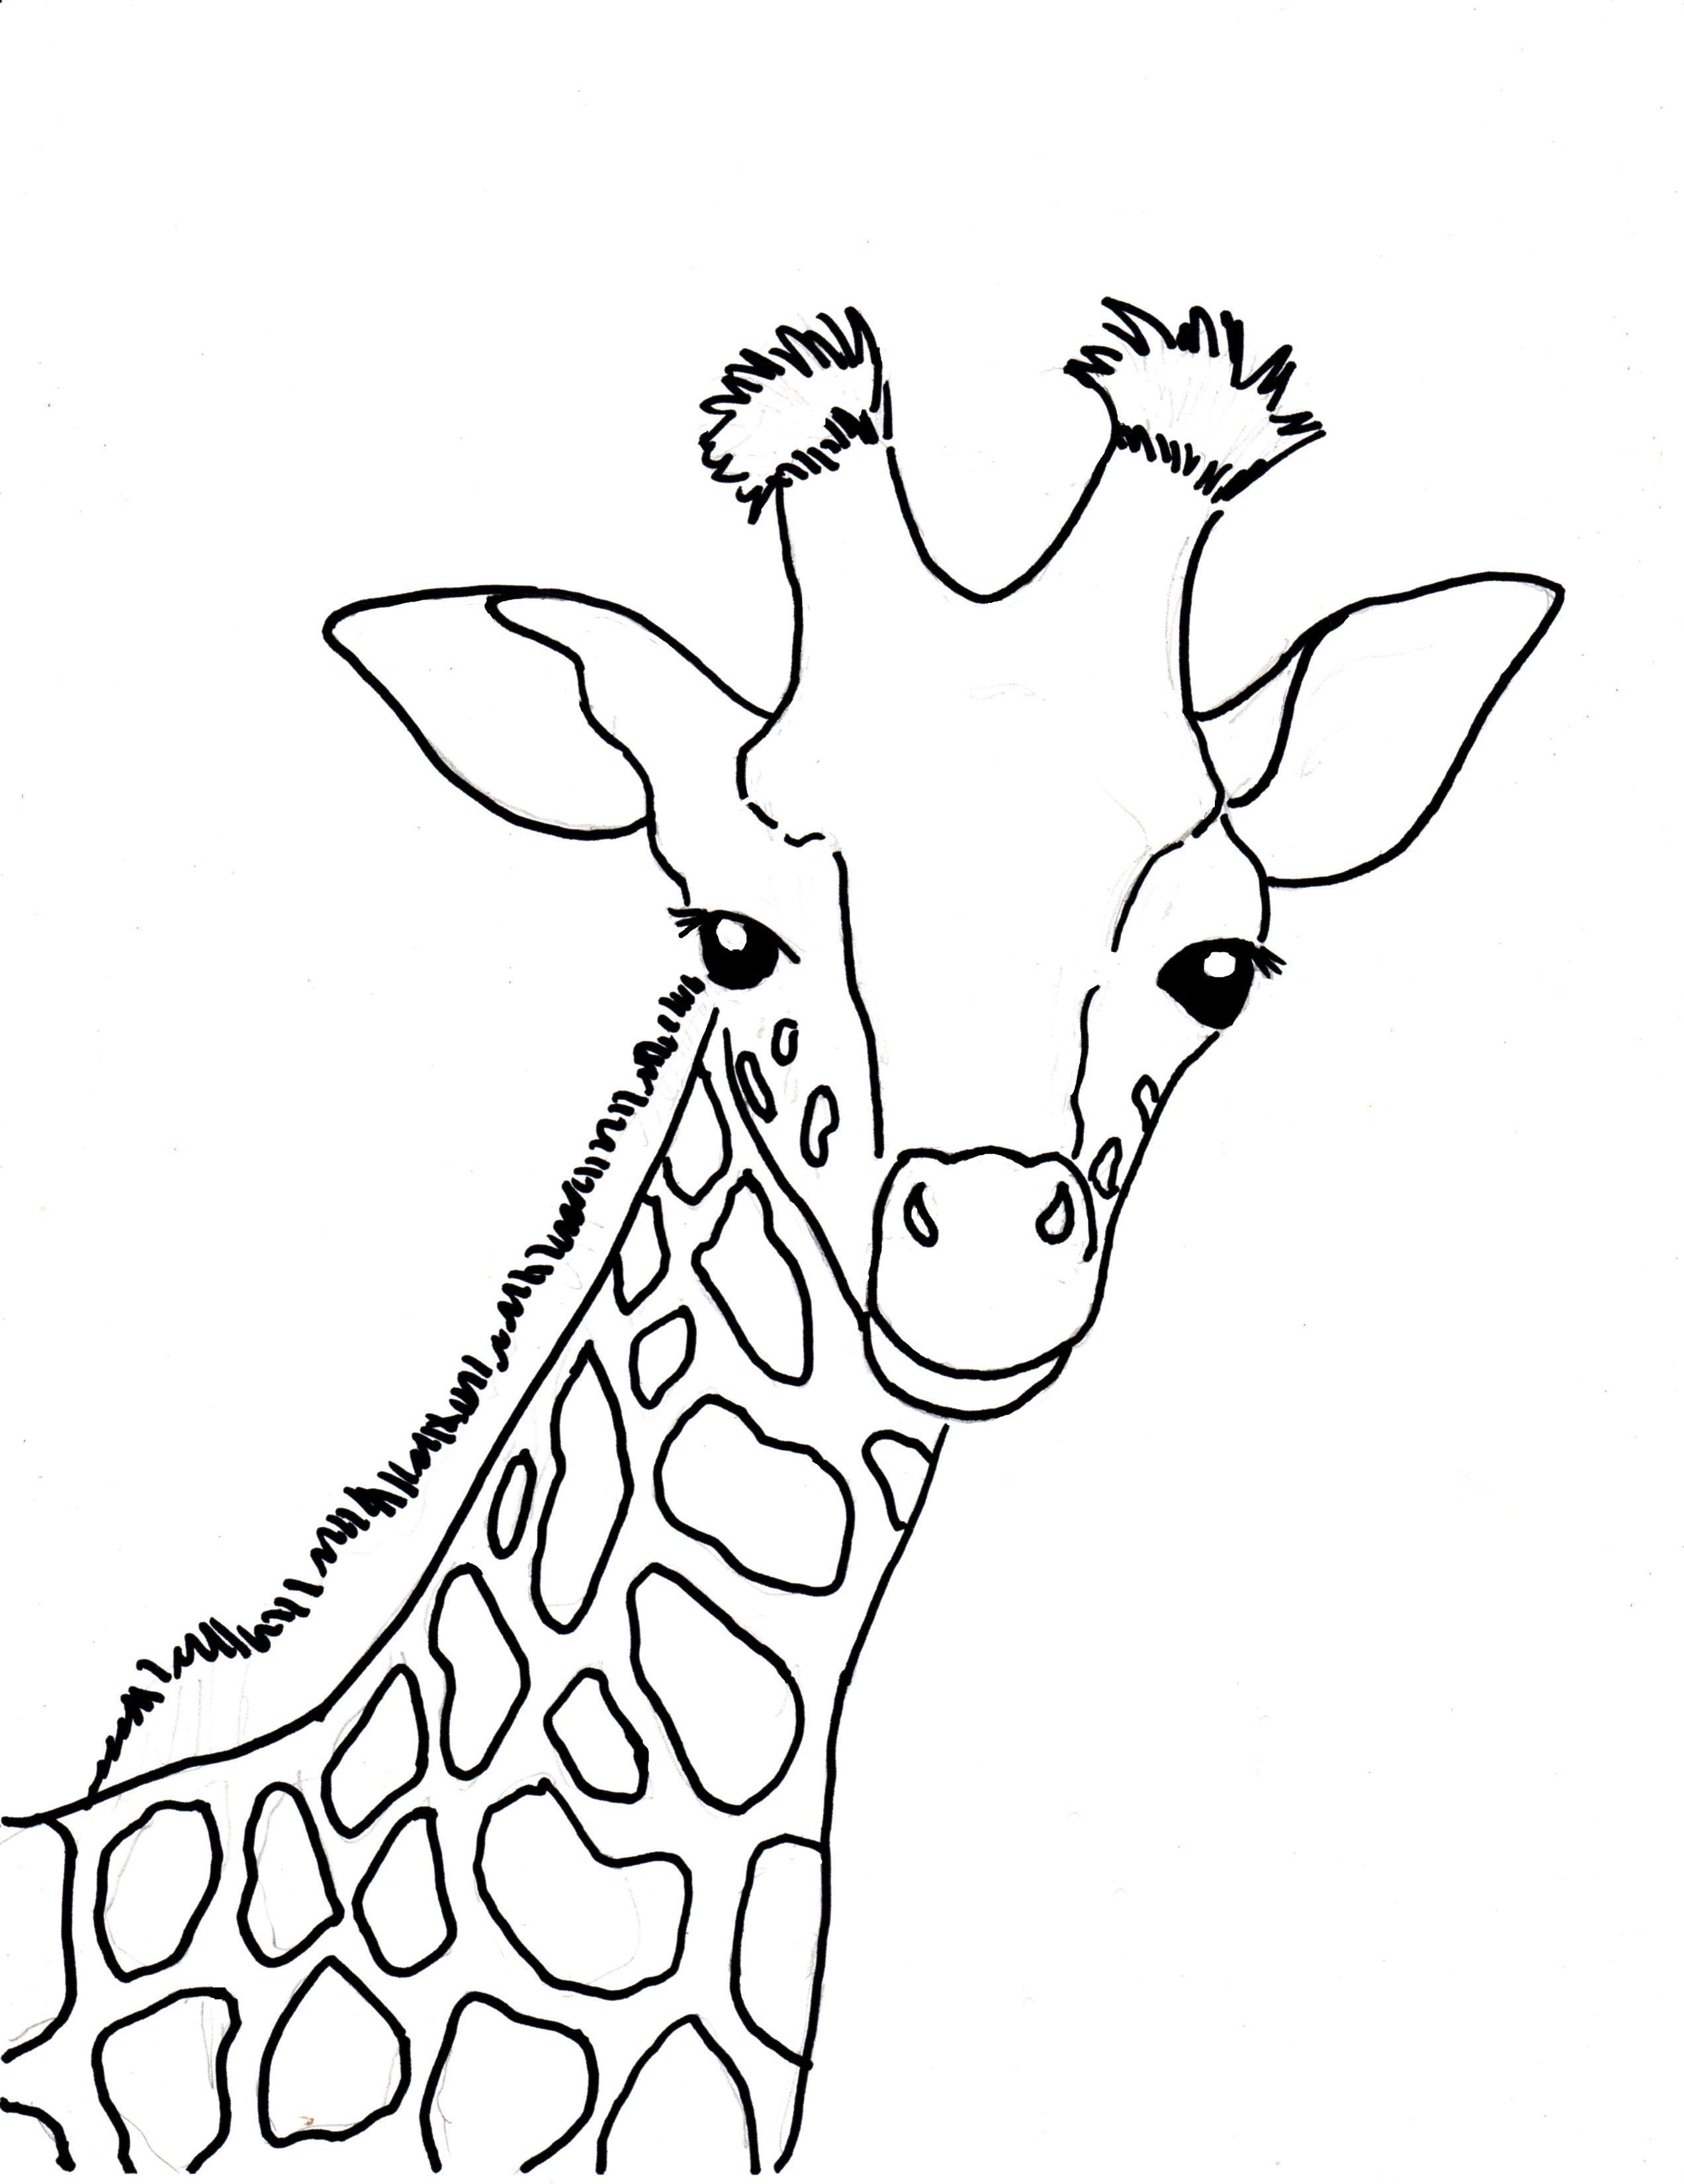 Baby Giraffe Coloring Page Samantha Bell Search Results Fun Giraffe Coloring Pages Giraffe Drawing Cartoon Giraffe